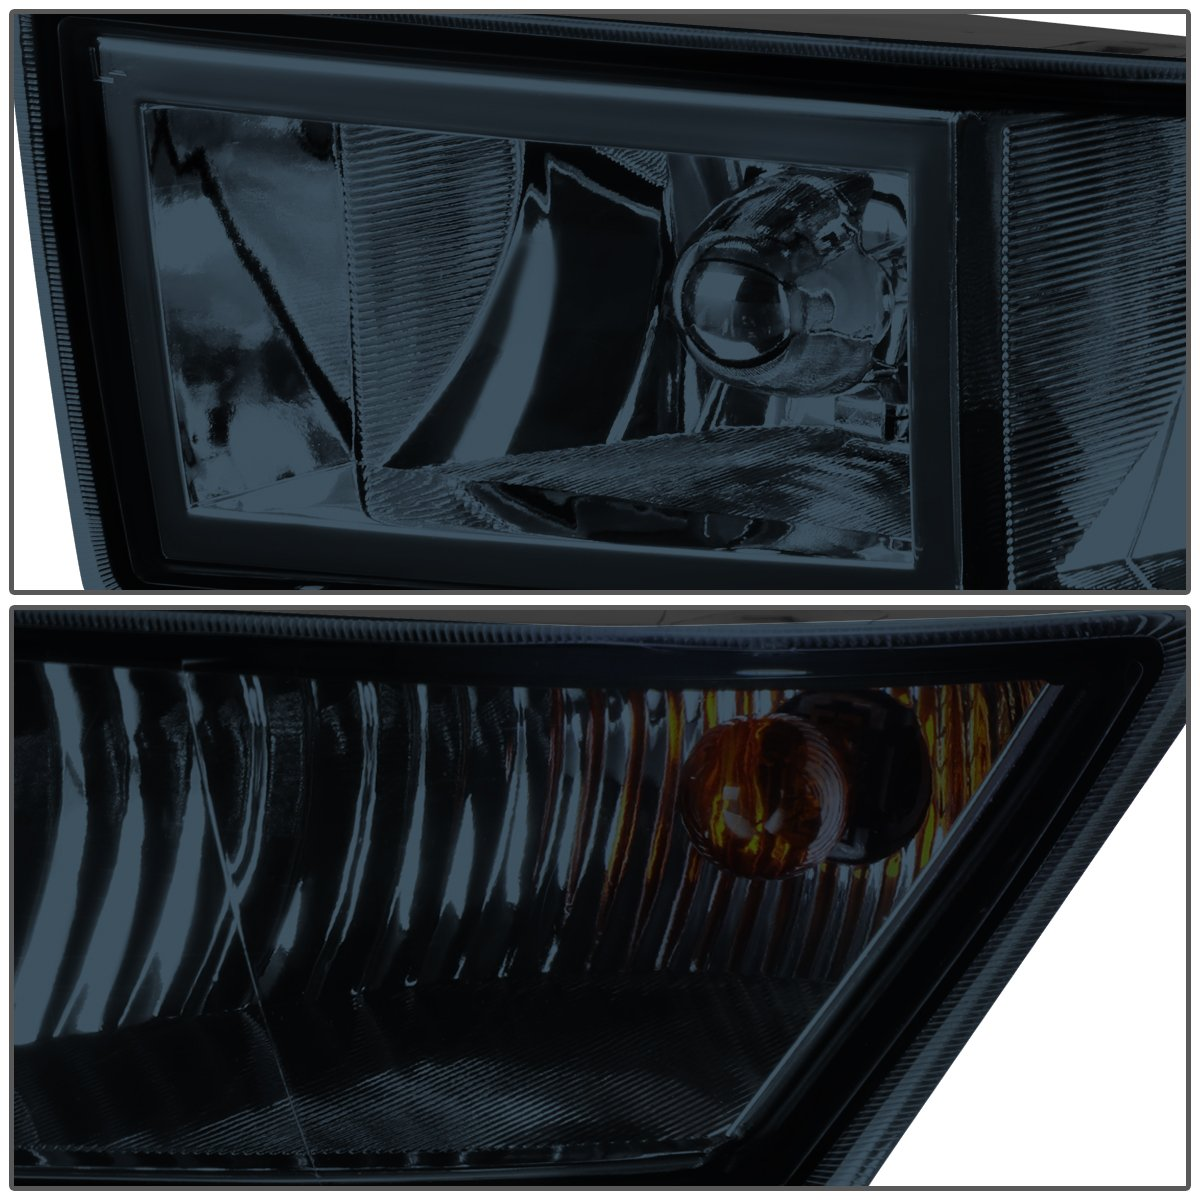 Driver /& Passenger Side DNA Motoring Clear FL-ZTL-801-CH Fog Light Assembly